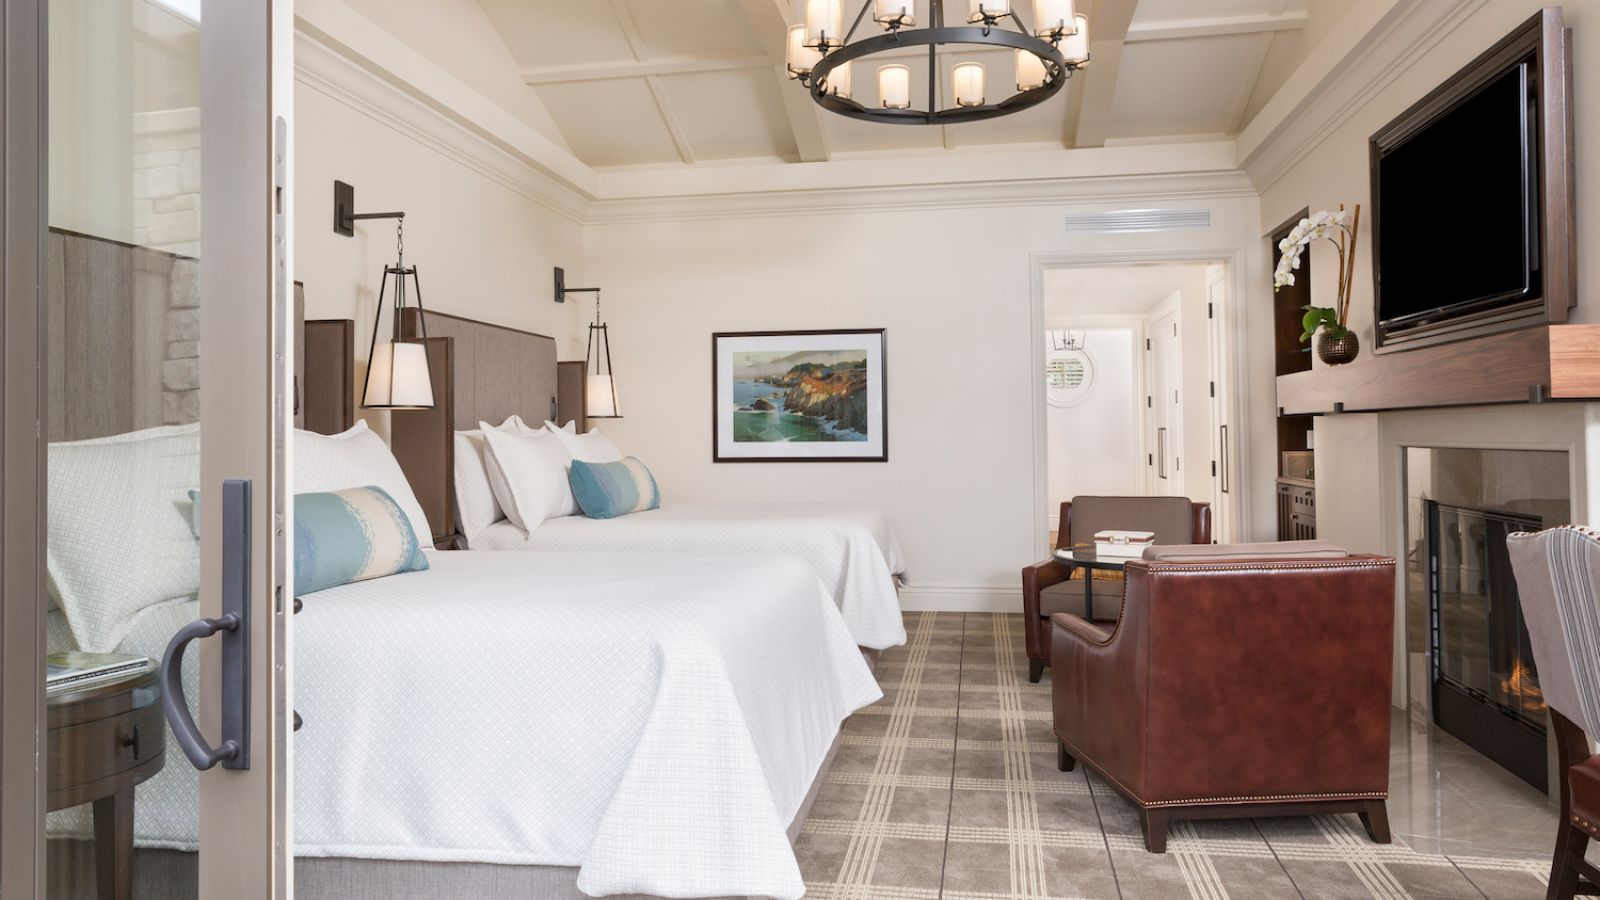 Fairway One Room Facing Interior - Pebble Beach Resorts® - © Noah Webb